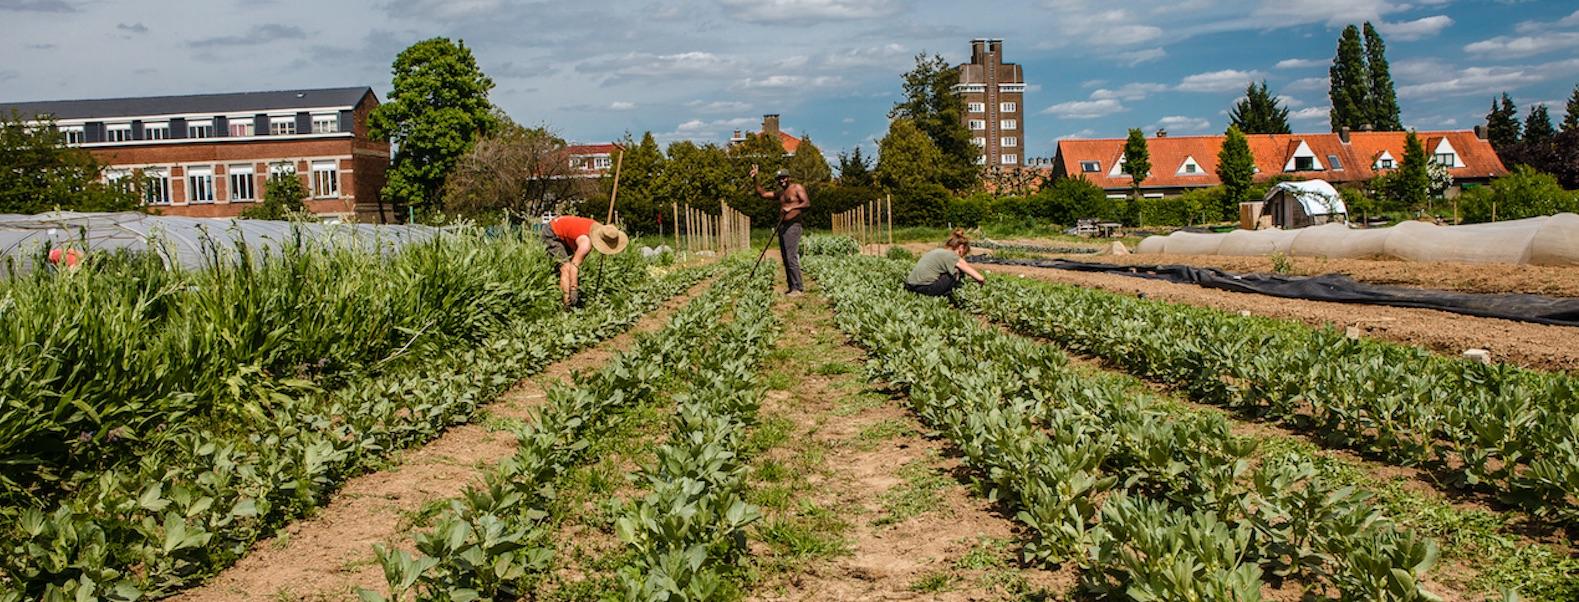 Watermael-Boitsfort (Bruxelles), potagers communautaires. © VP